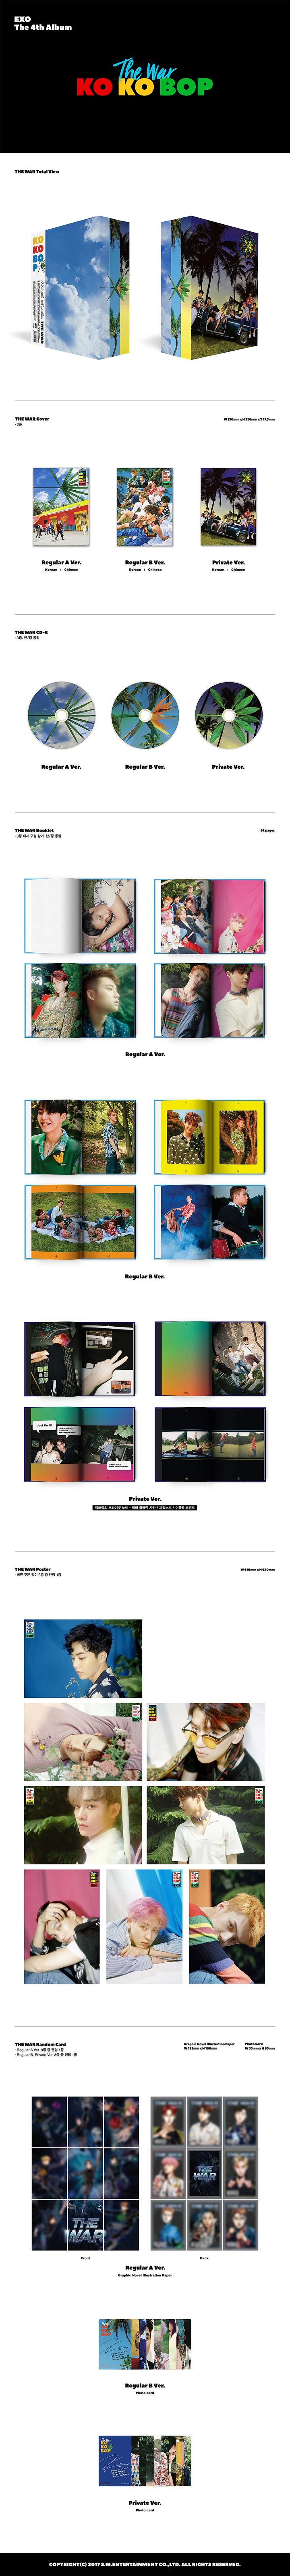 ImageViewerEShop